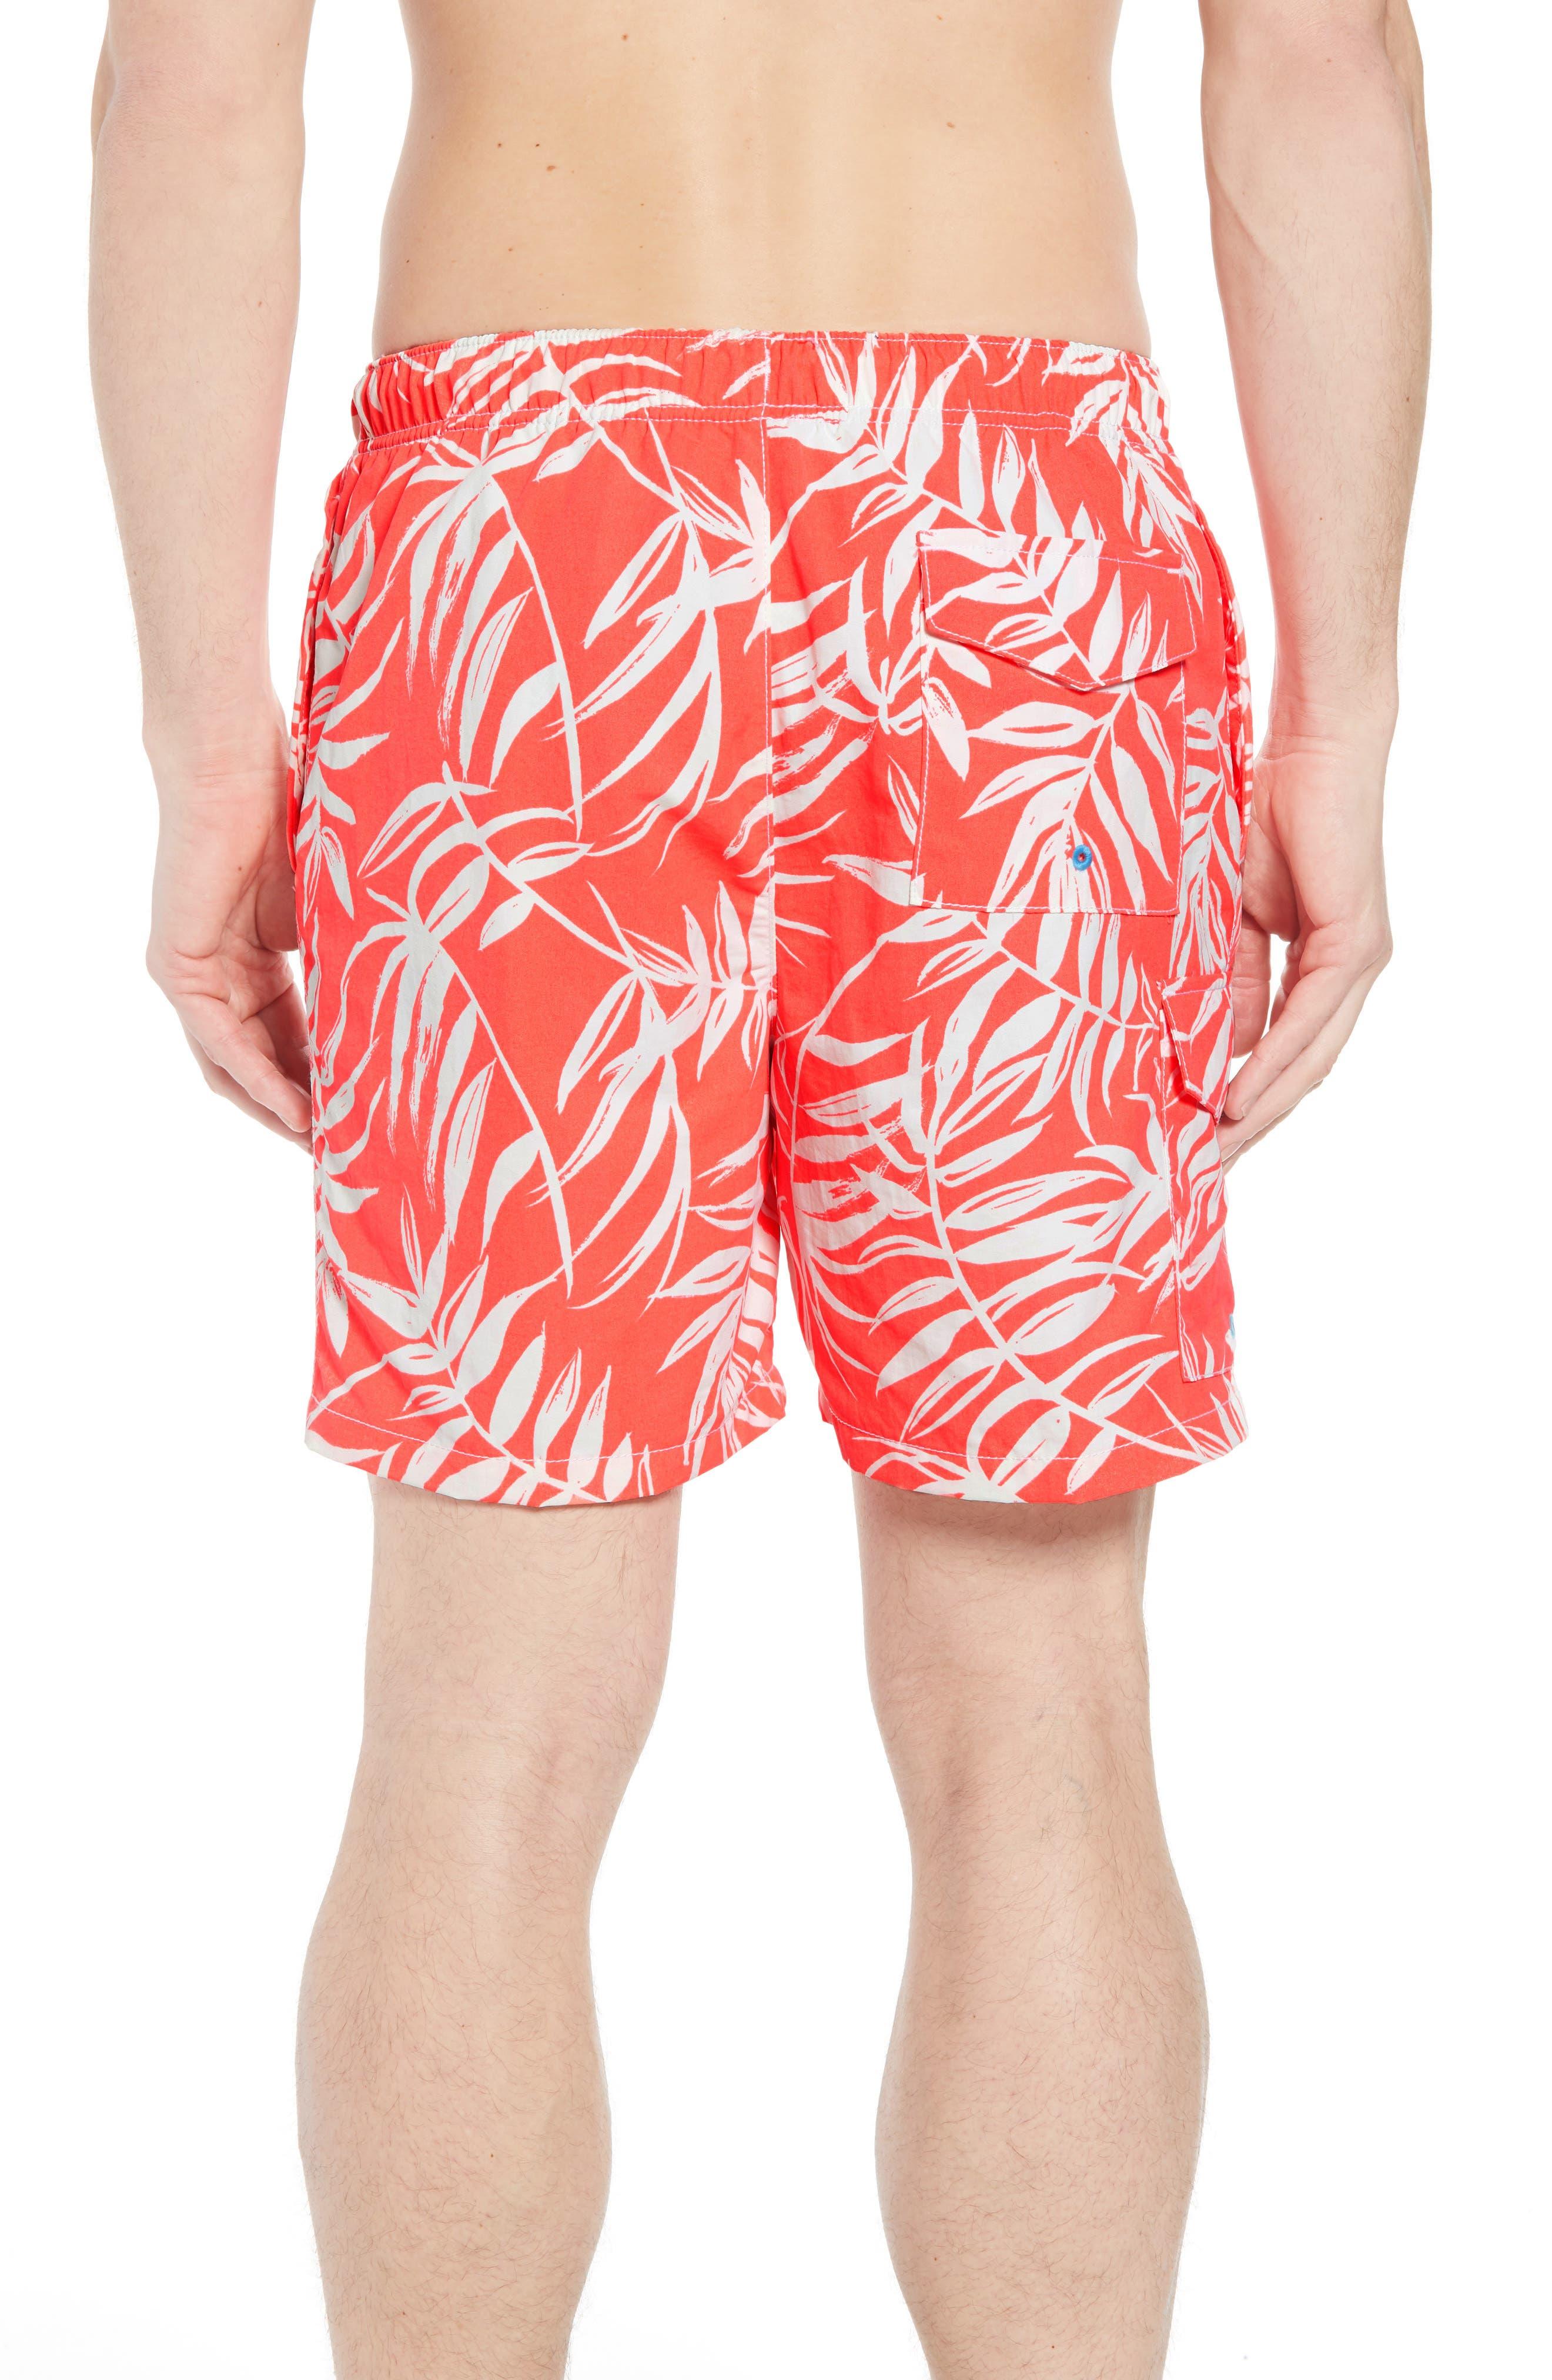 Naples Muy Caliente Swim Trunks,                             Alternate thumbnail 2, color,                             Electric Coral